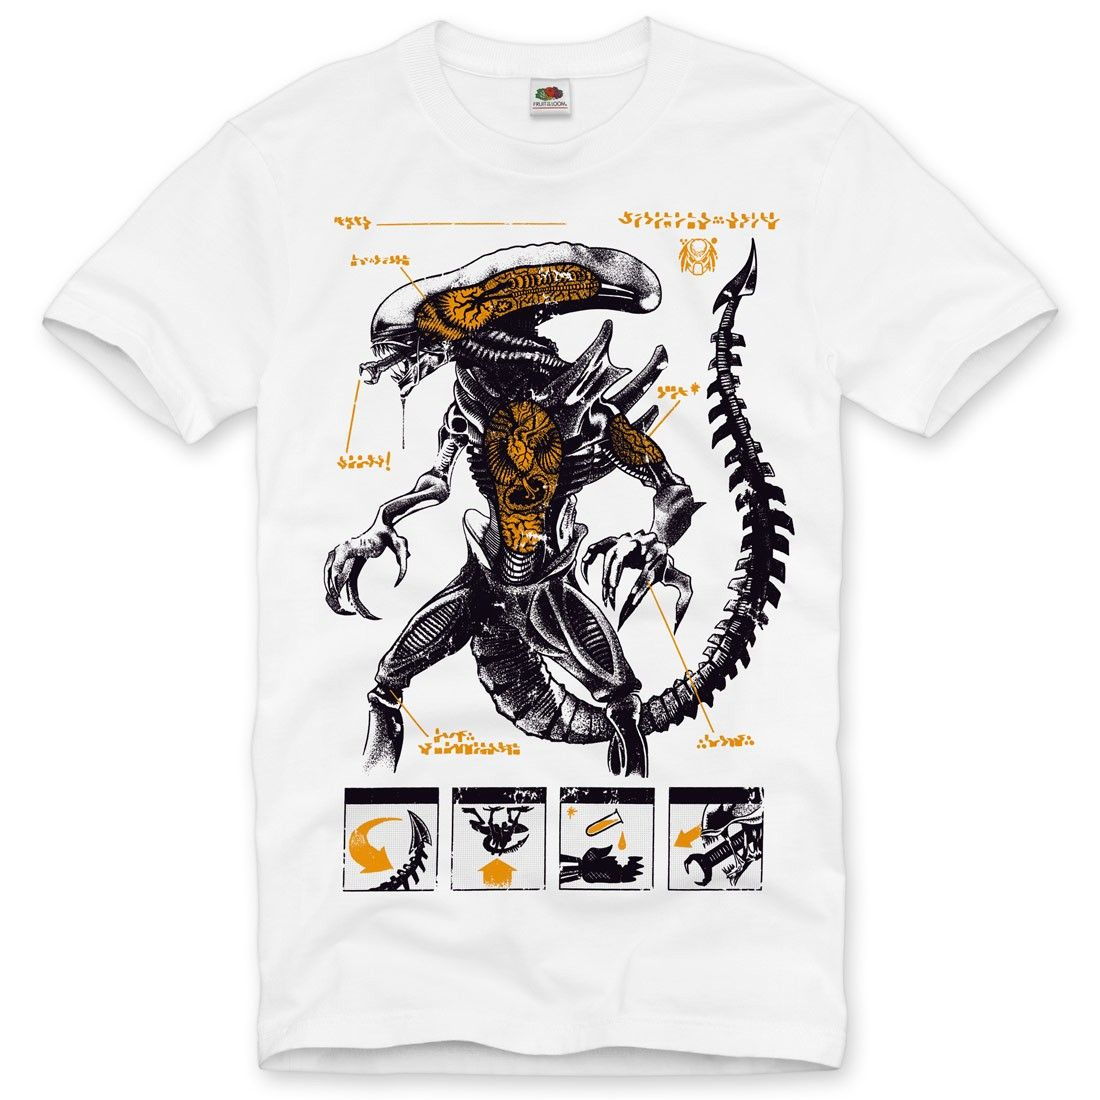 Details About Alien Xenomorph Mens T Shirt Ripley Movie - roblox xenomorph shirt